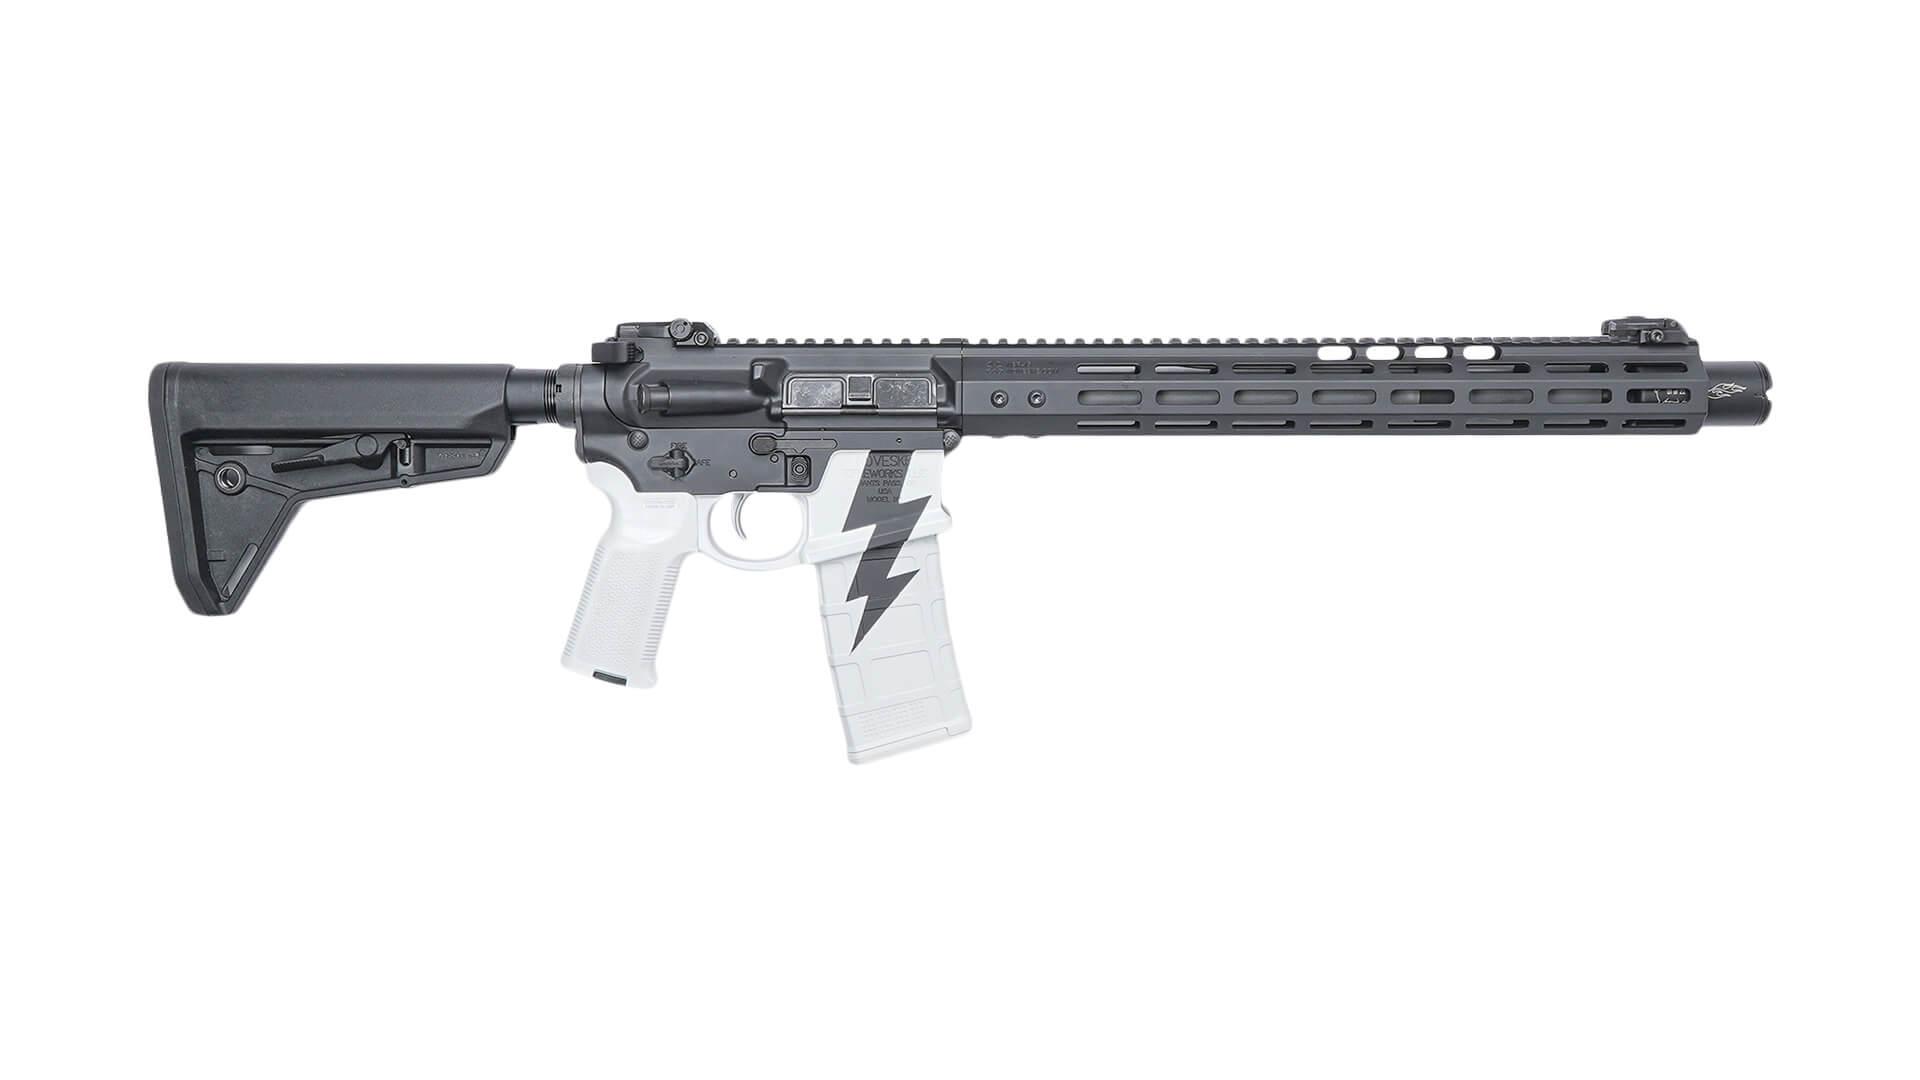 noveske rifleworks mark rust butcher infidel rifle ar-15 ar15